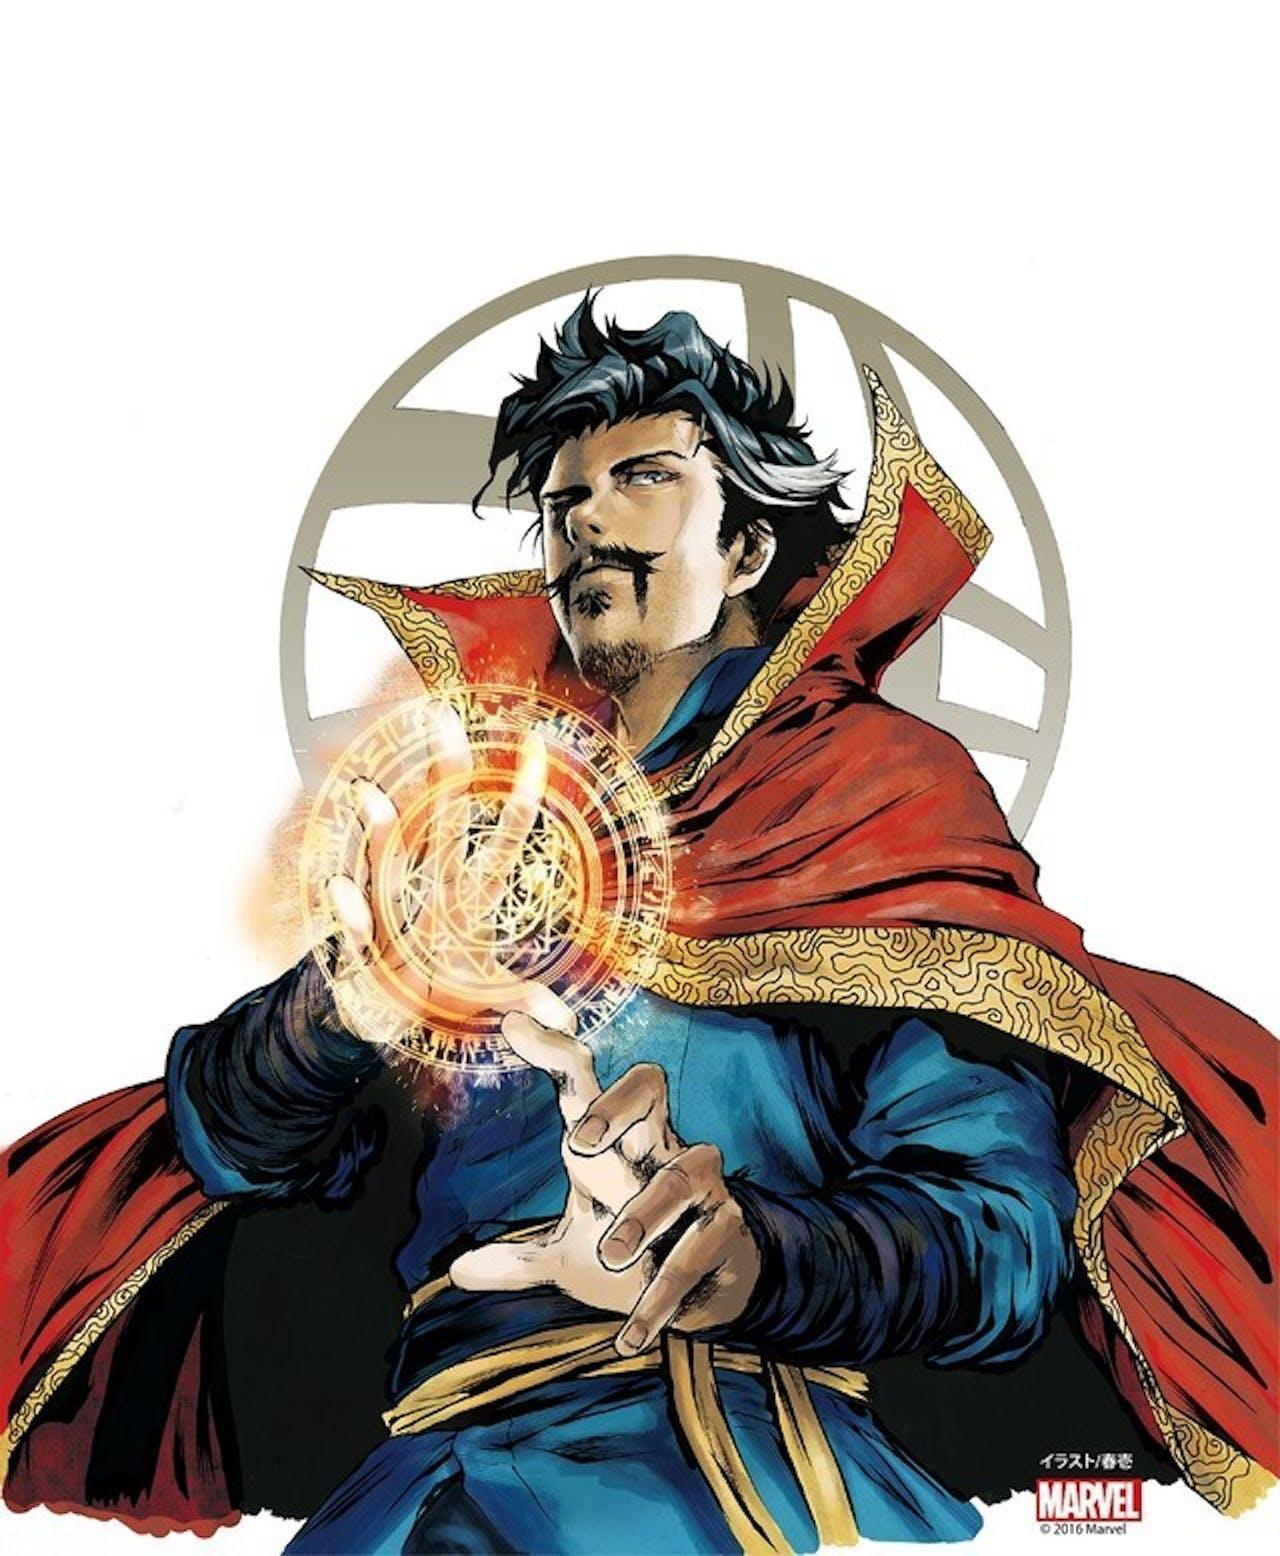 Doctor Strange Episode 0 by manga artist Haruichi